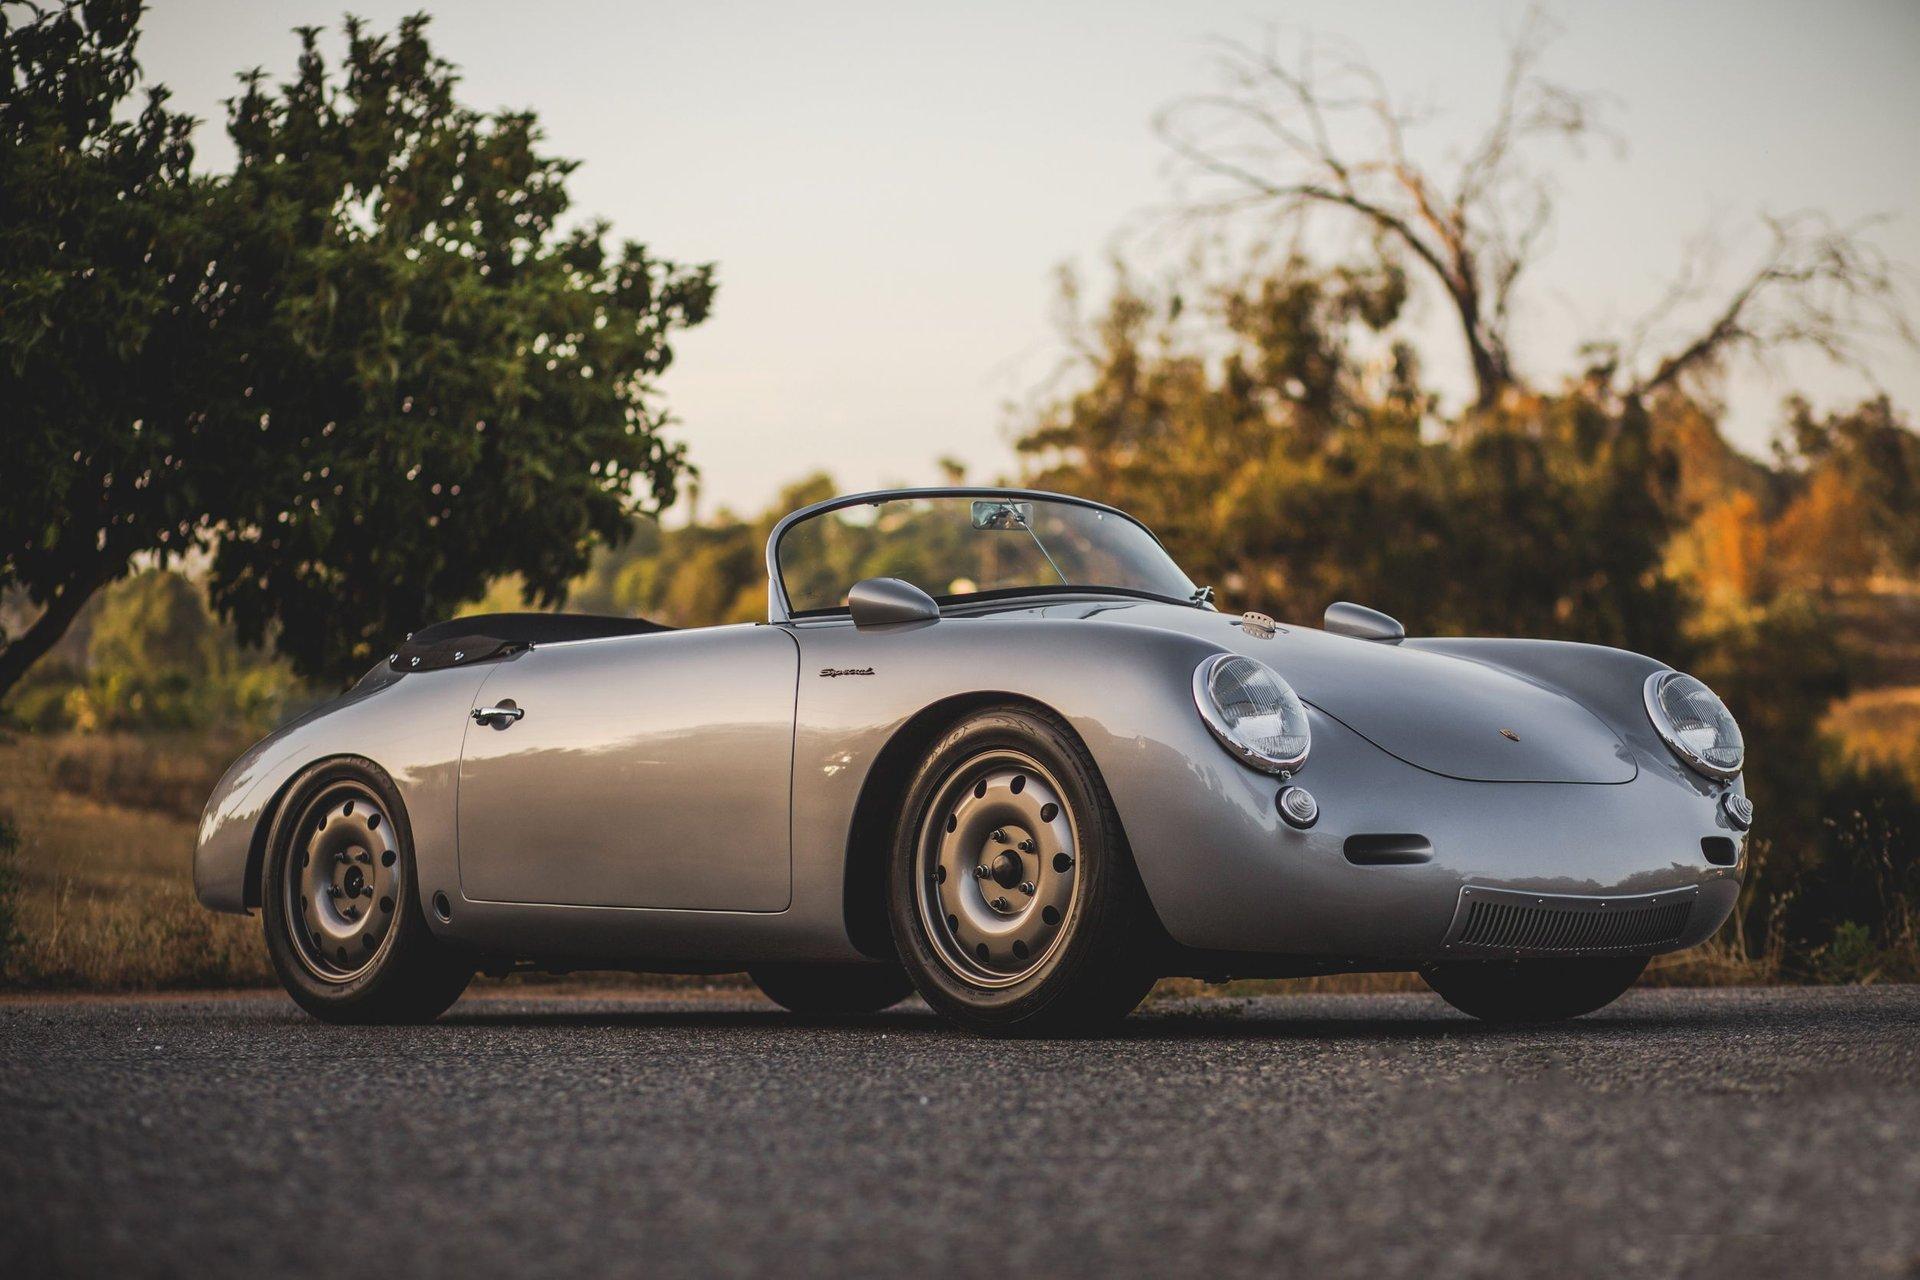 1962 Porsche 356 Emory Special Roadster